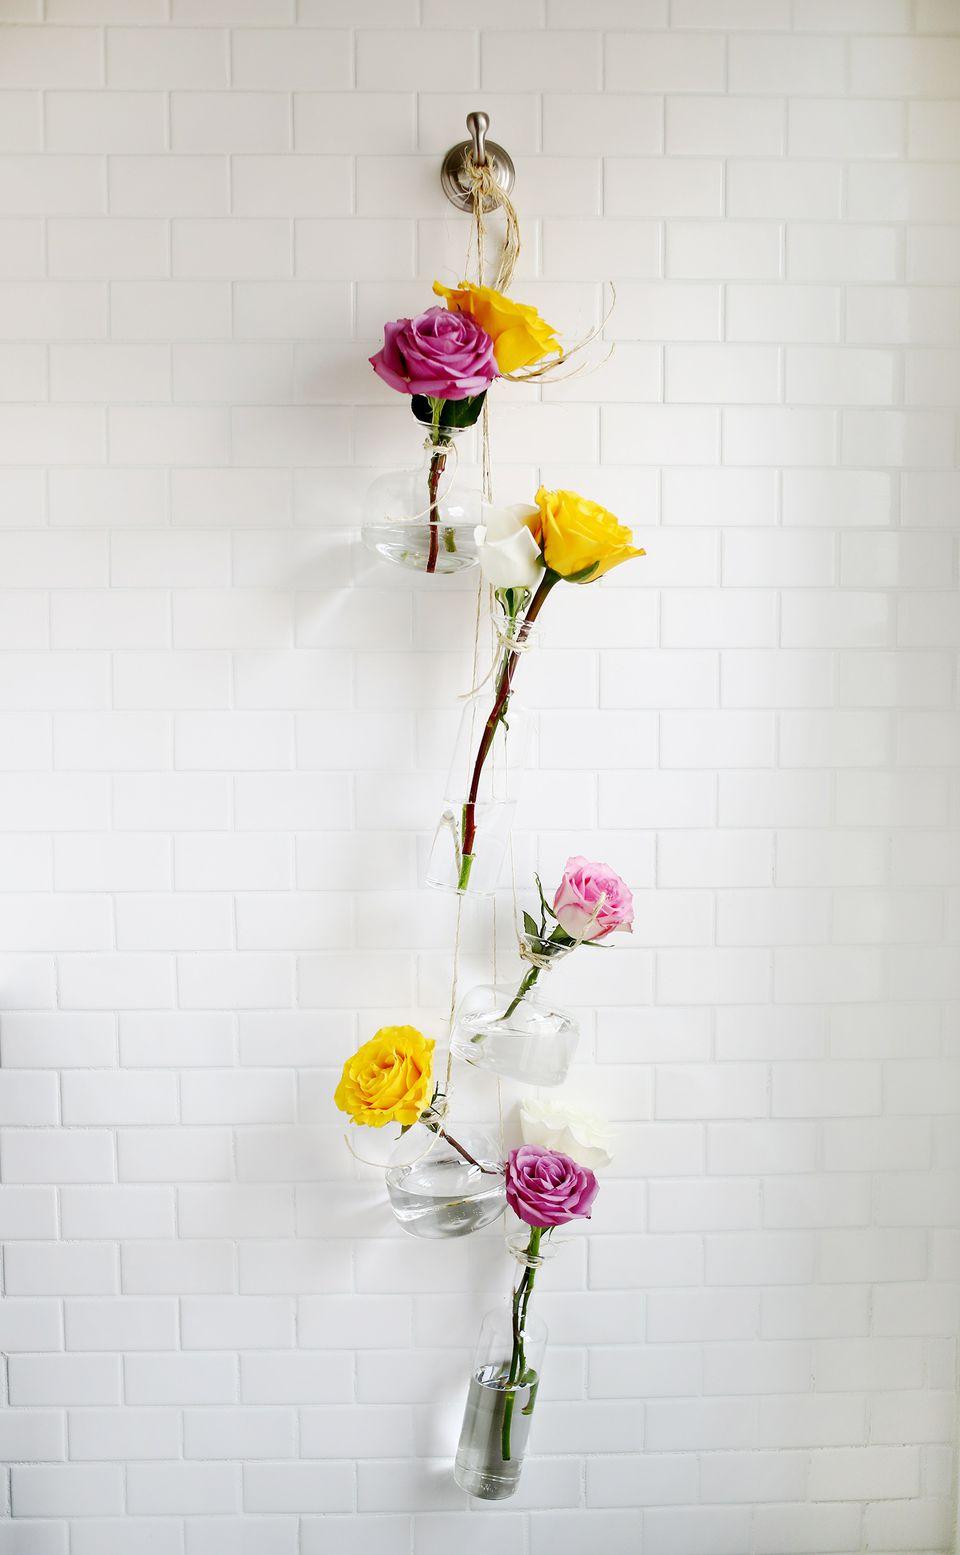 35 diy vases perfect for spring diy hanging vases display reviewsmspy